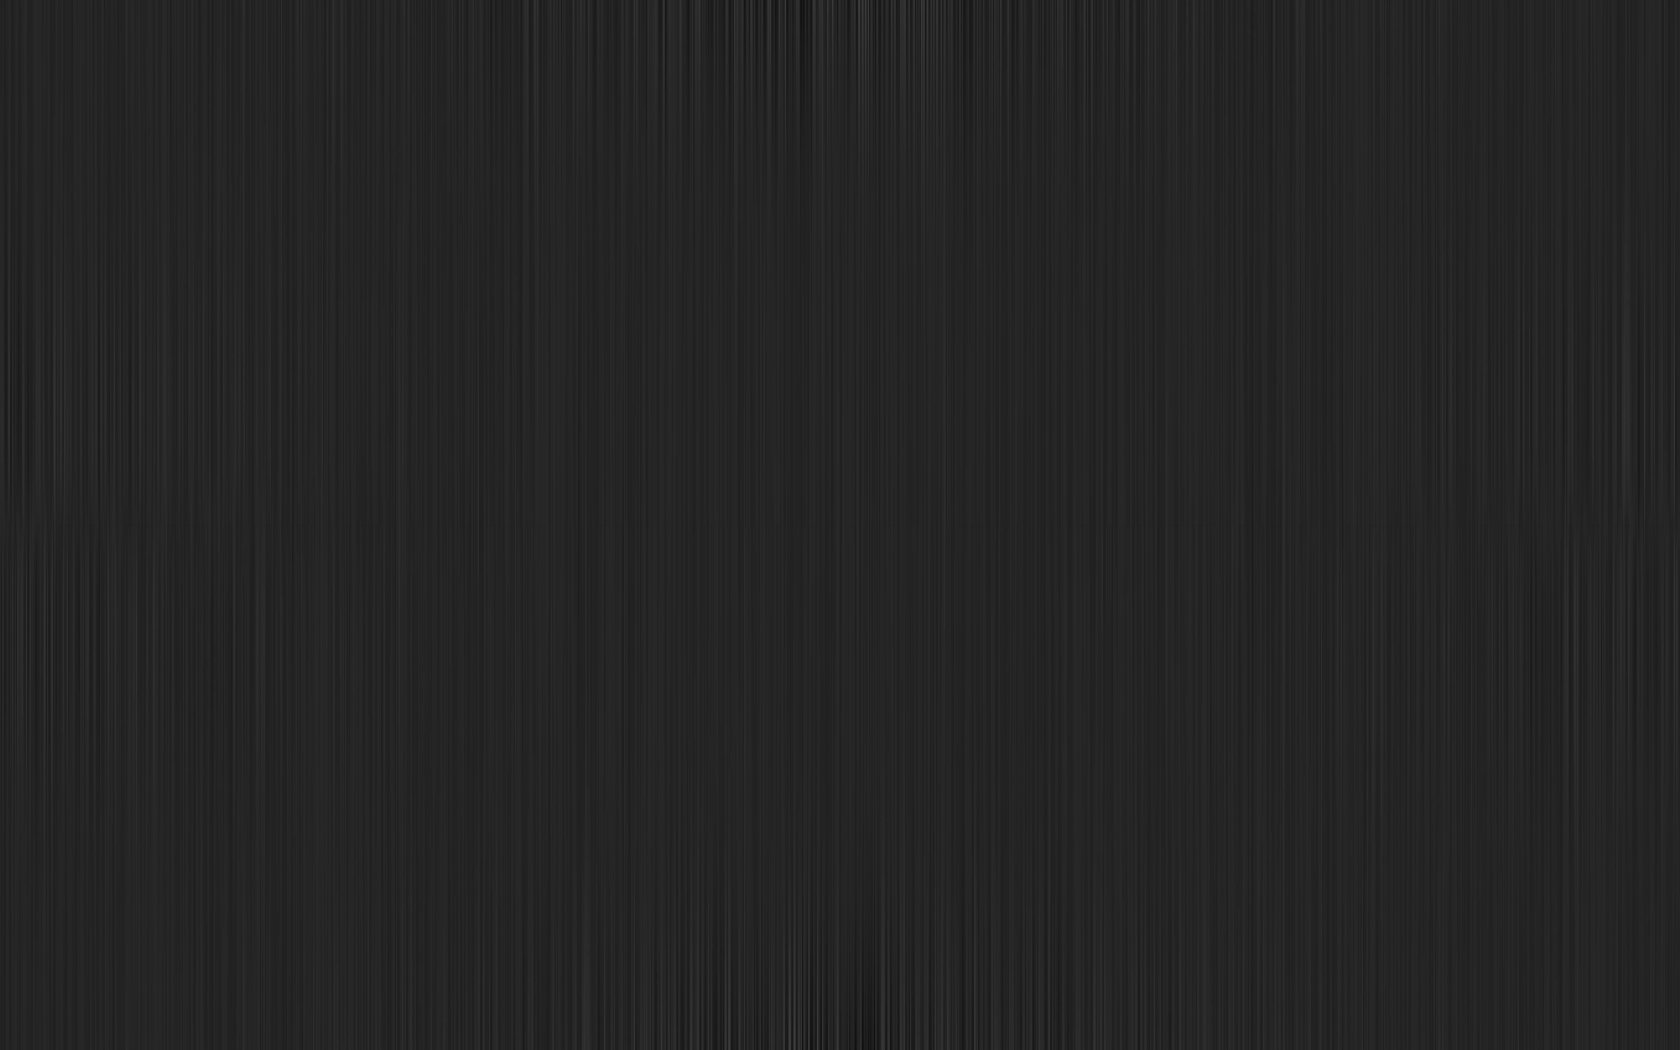 brushed_stripes_dark by 10r